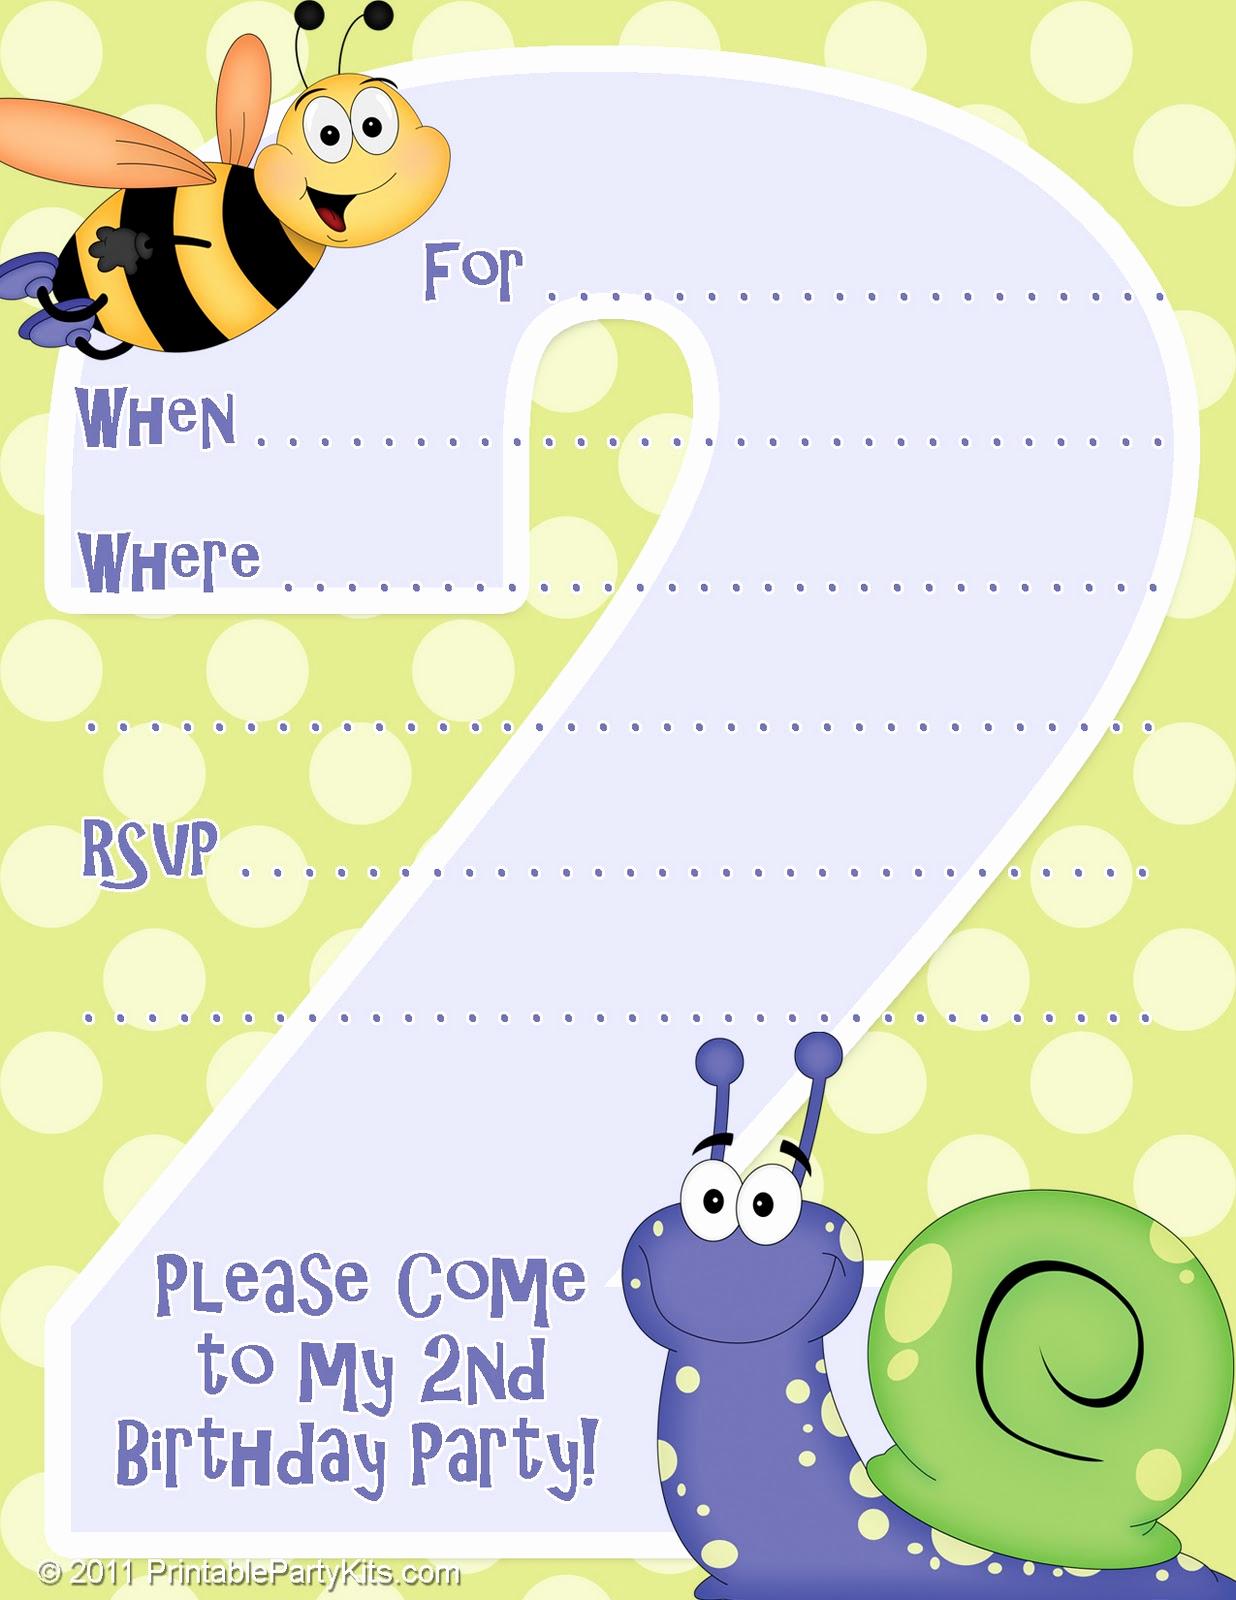 Free Printable Birthday Invitation Templates Awesome Free Printable Party Invitations Invitation Template for